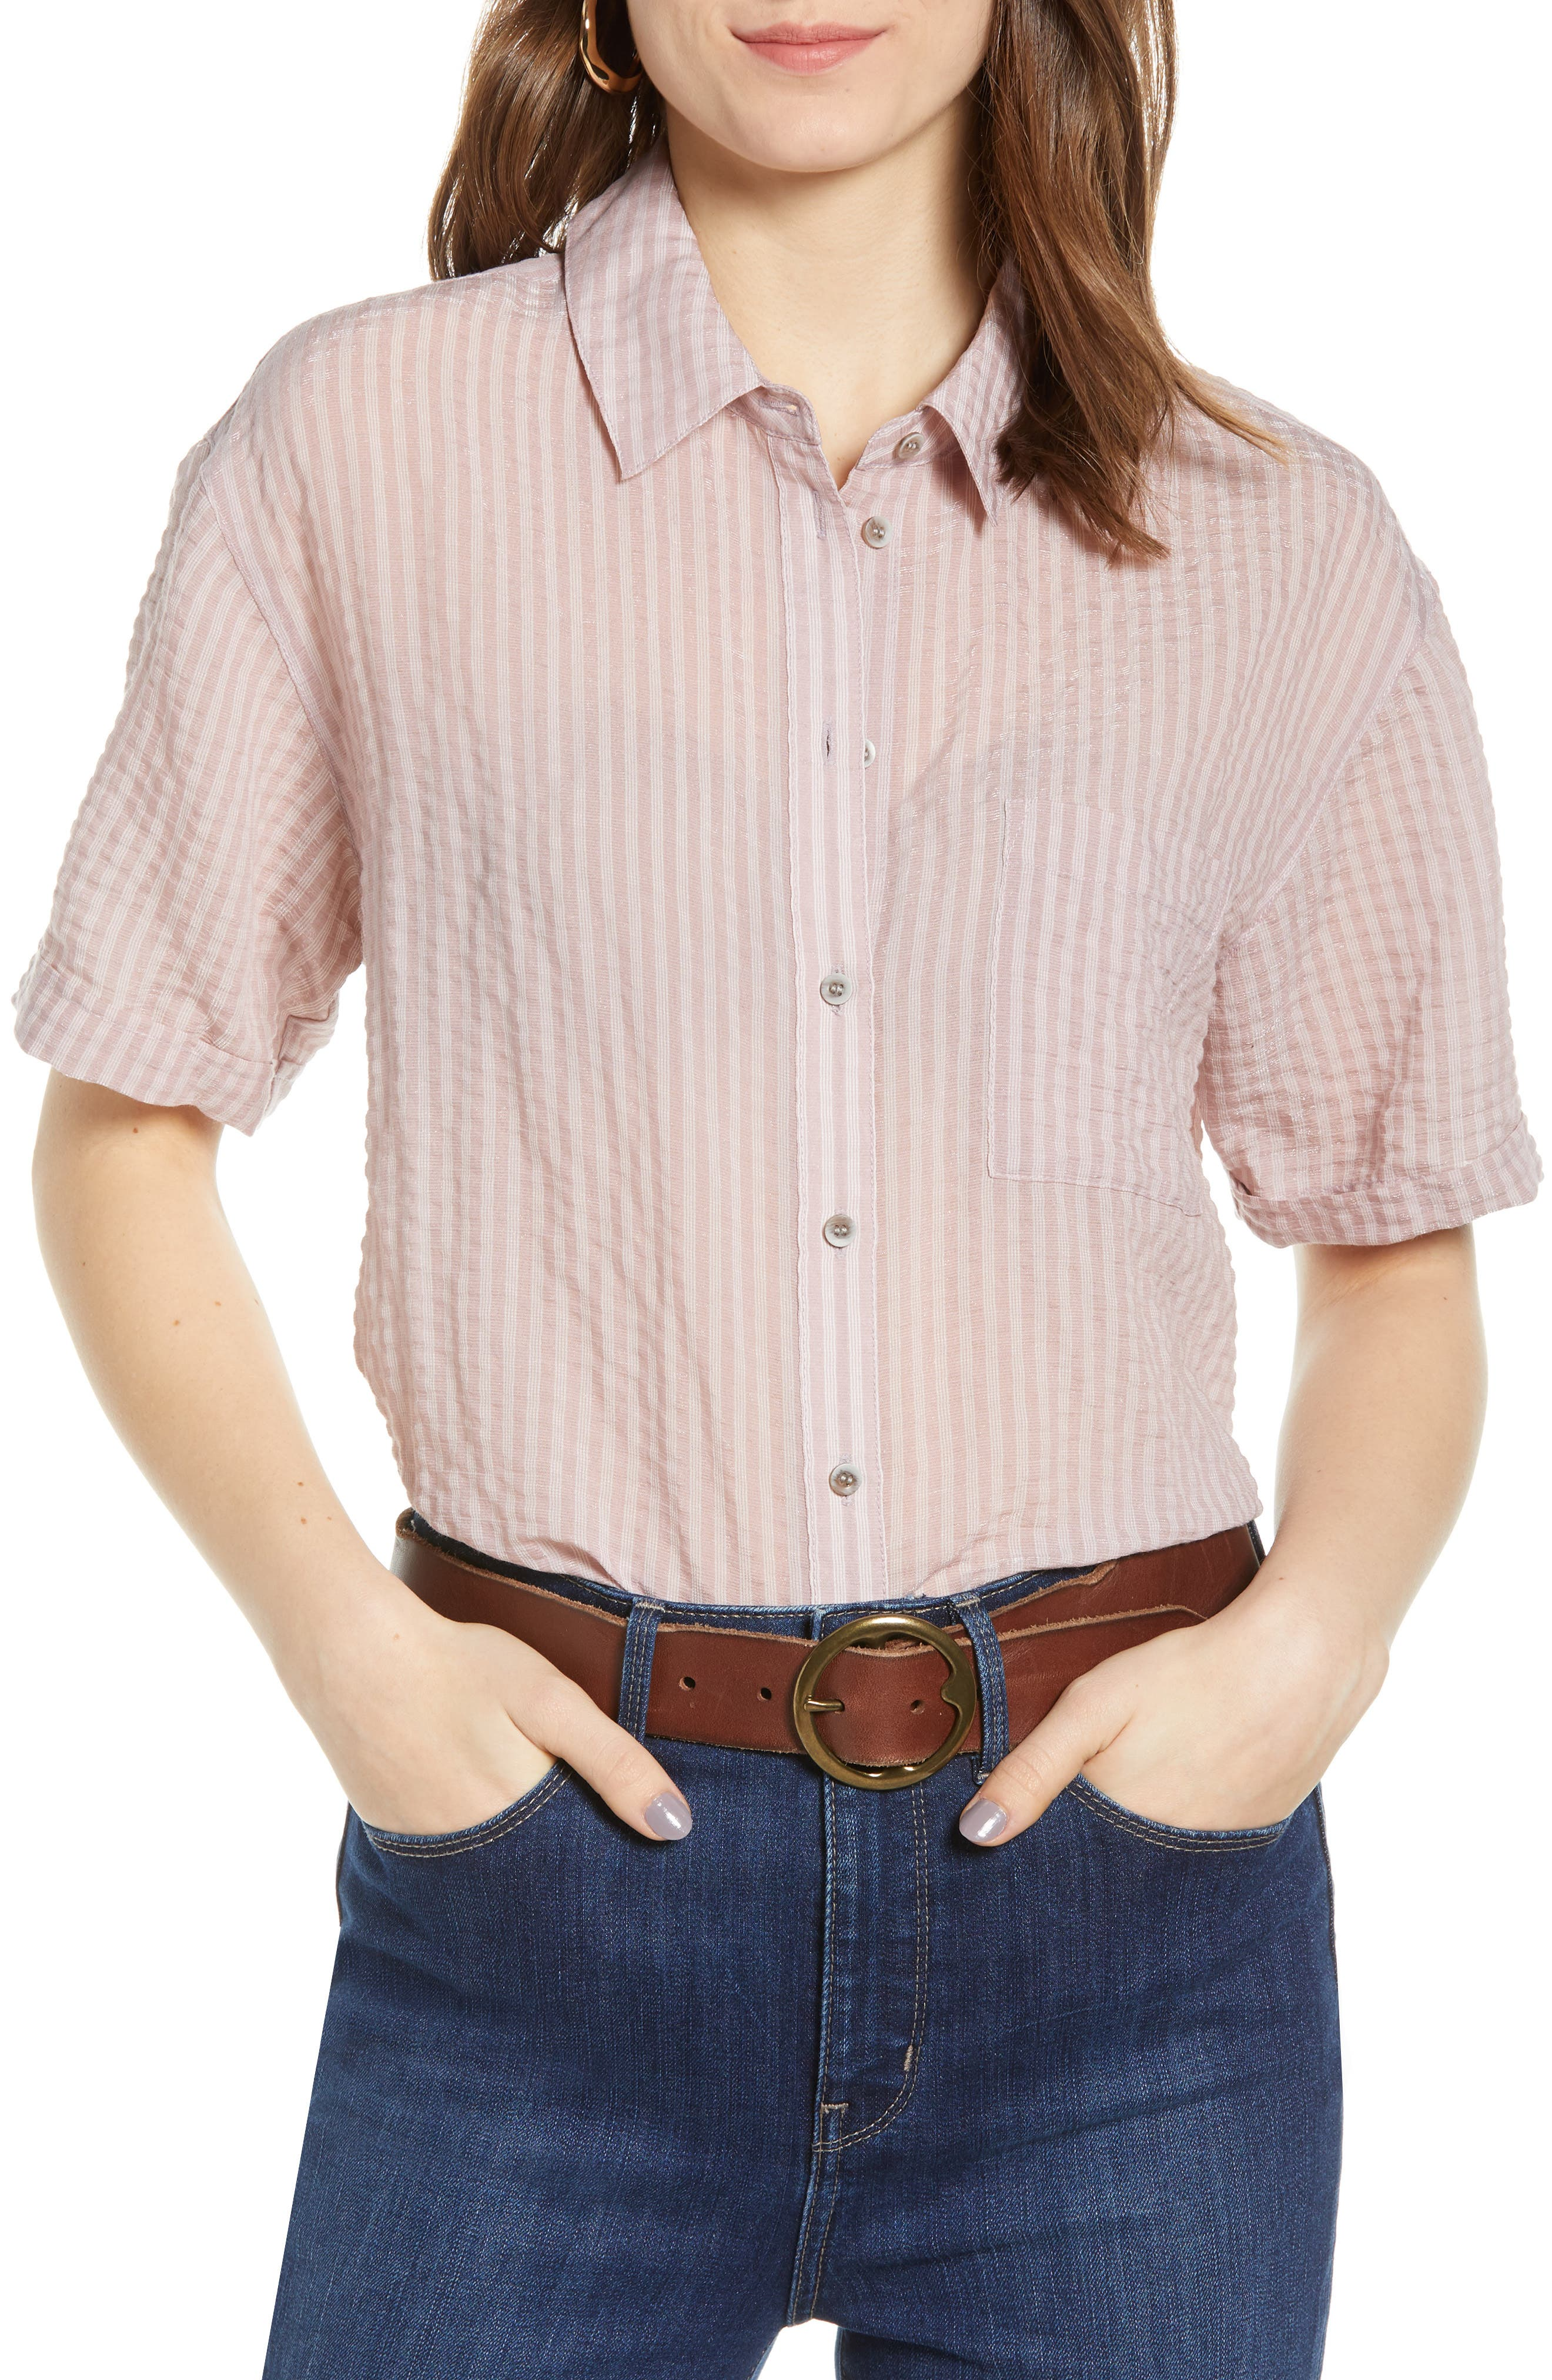 Stripe Short Sleeve Shirt, Main, color, PINK CANYON CLOUD STRIPE